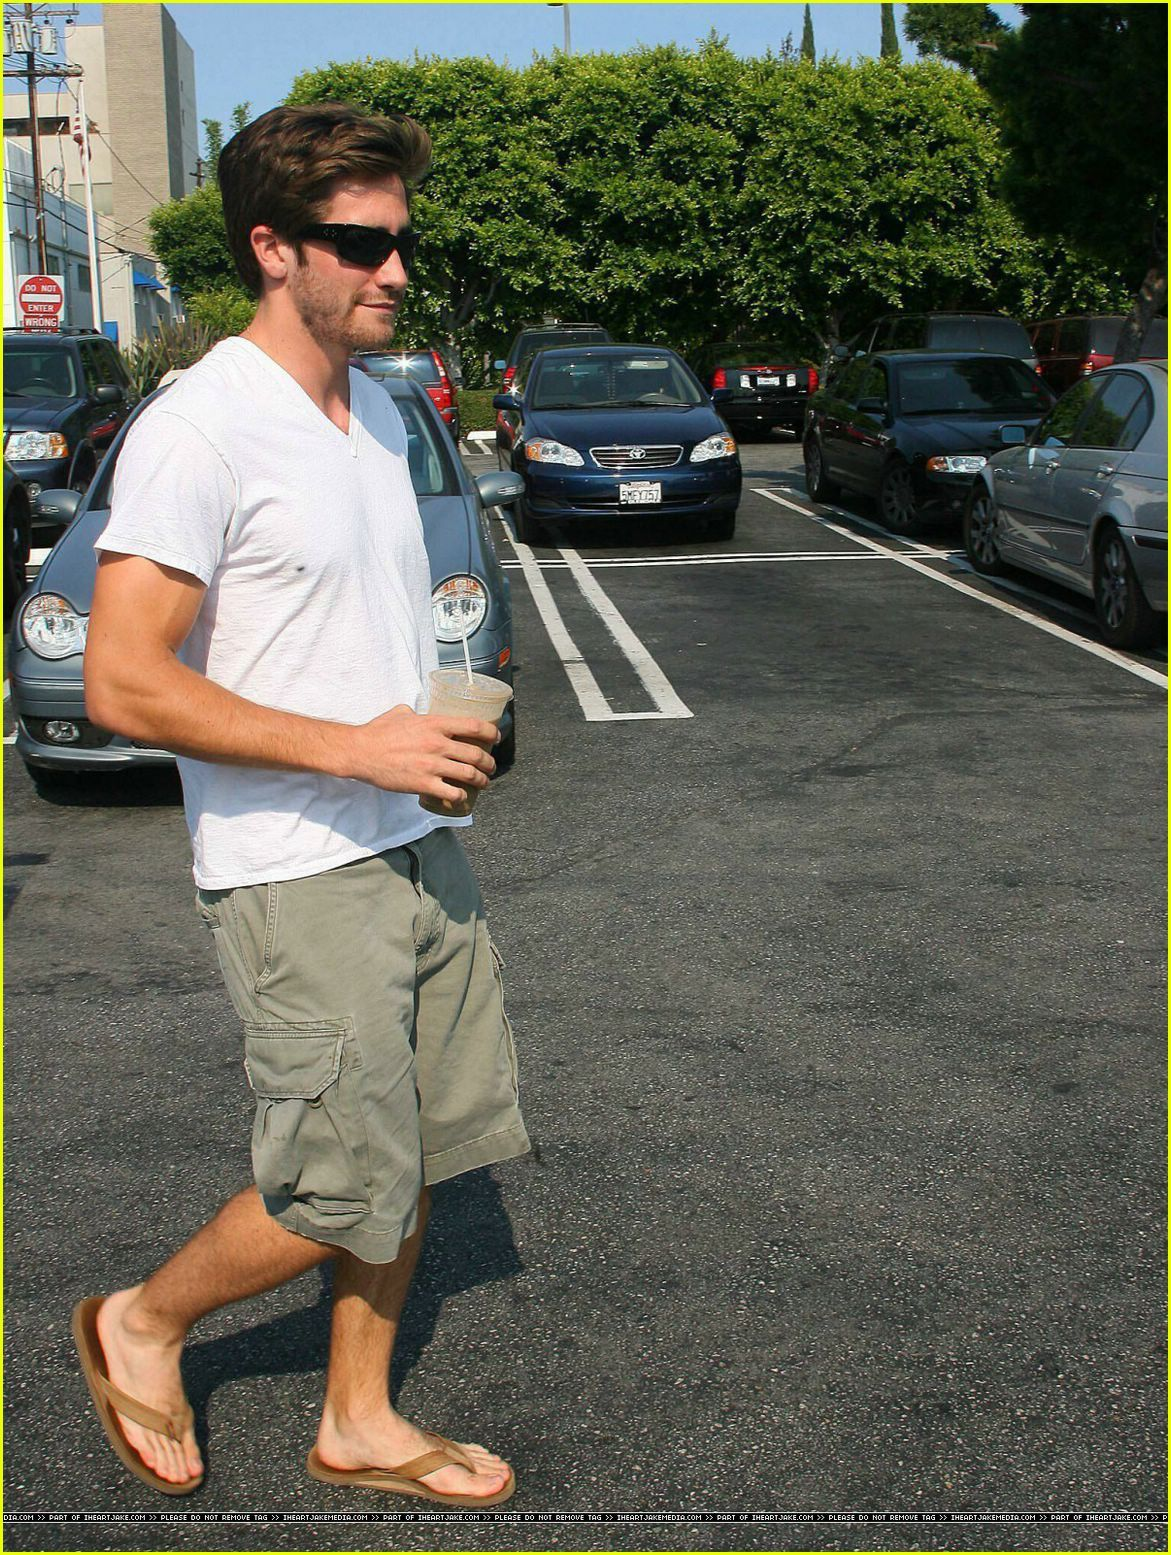 Jake gyllenhaal gay pics pictures